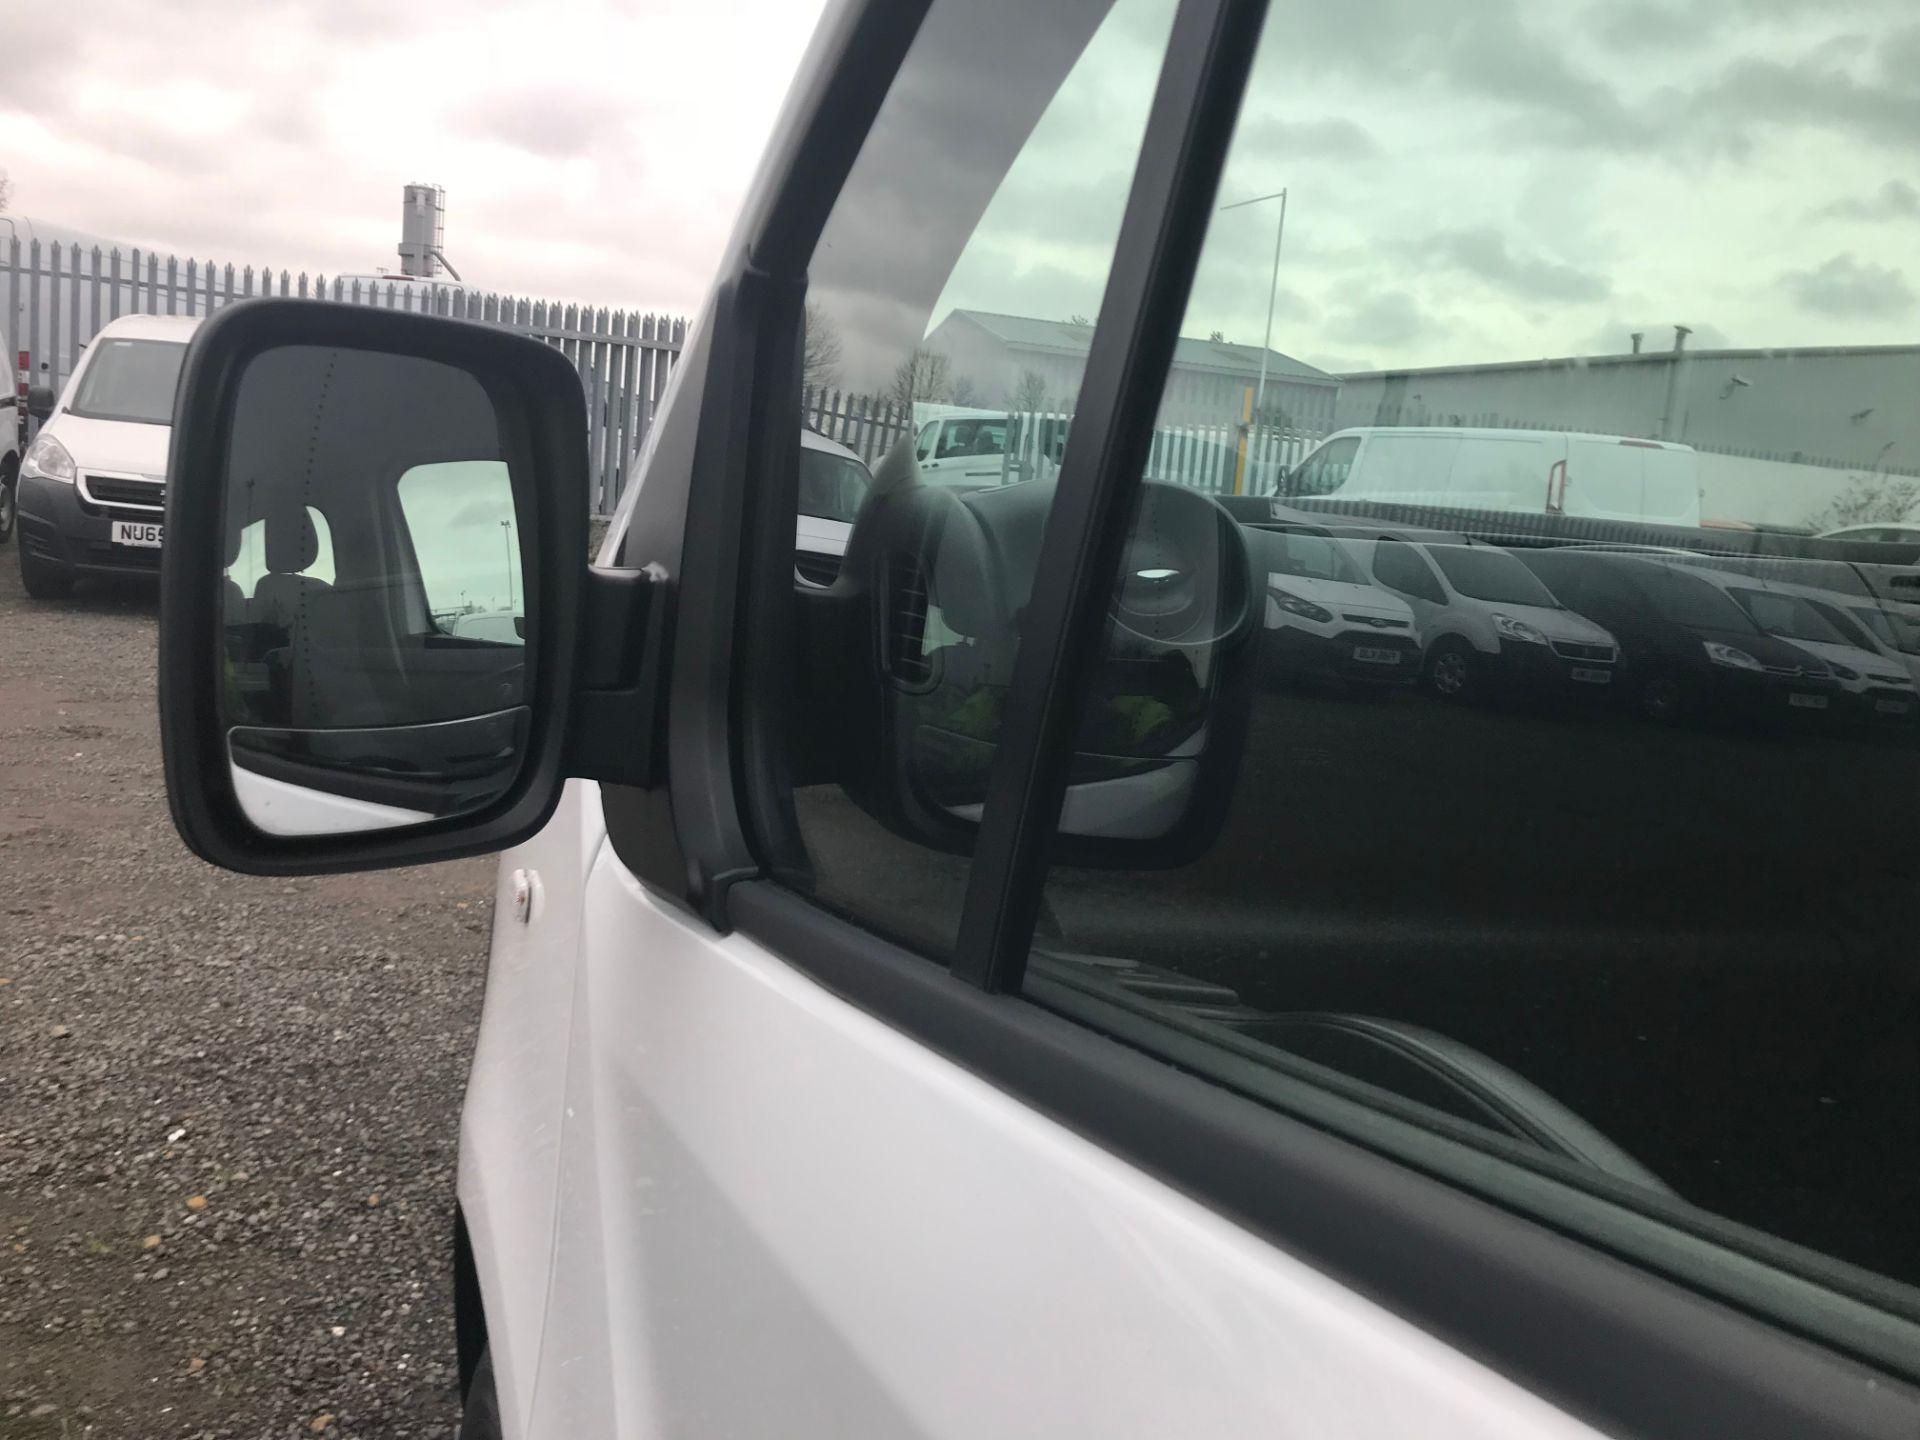 2017 Vauxhall Vivaro 2900 1.6Cdti Biturbo 125Ps H1 Combi 9 Seat (DY17UGS) Image 18